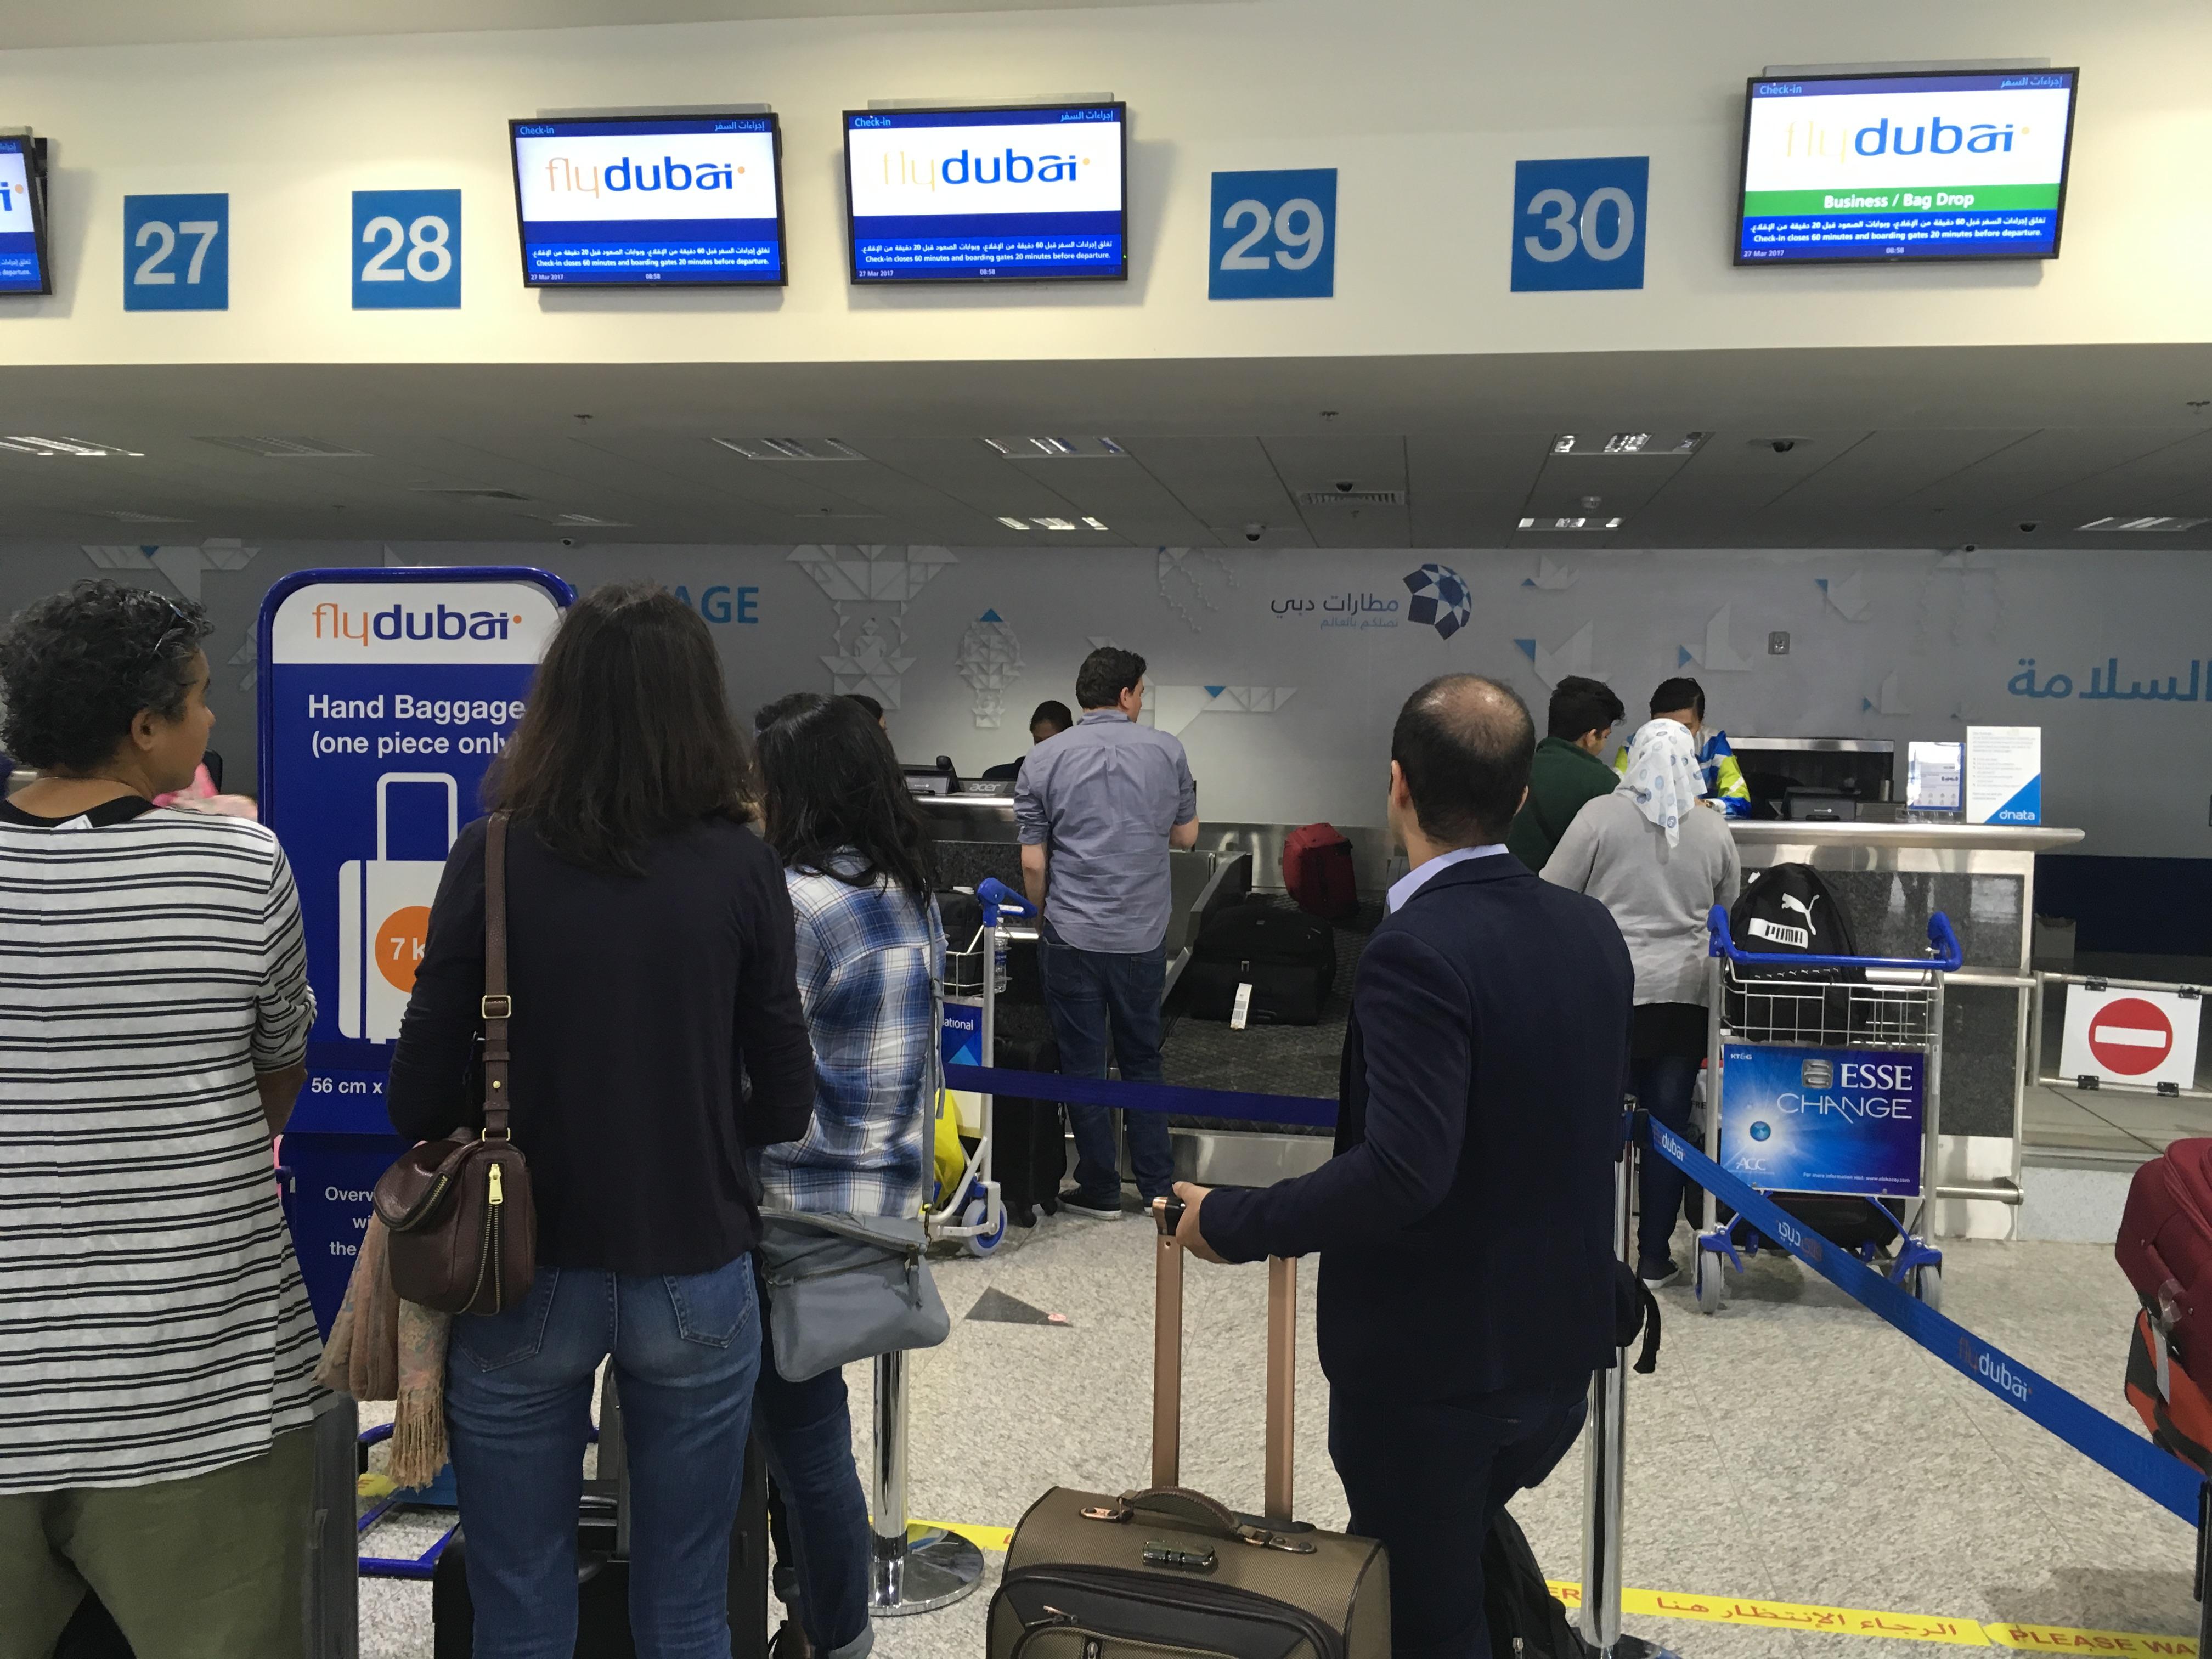 late flights from dubai